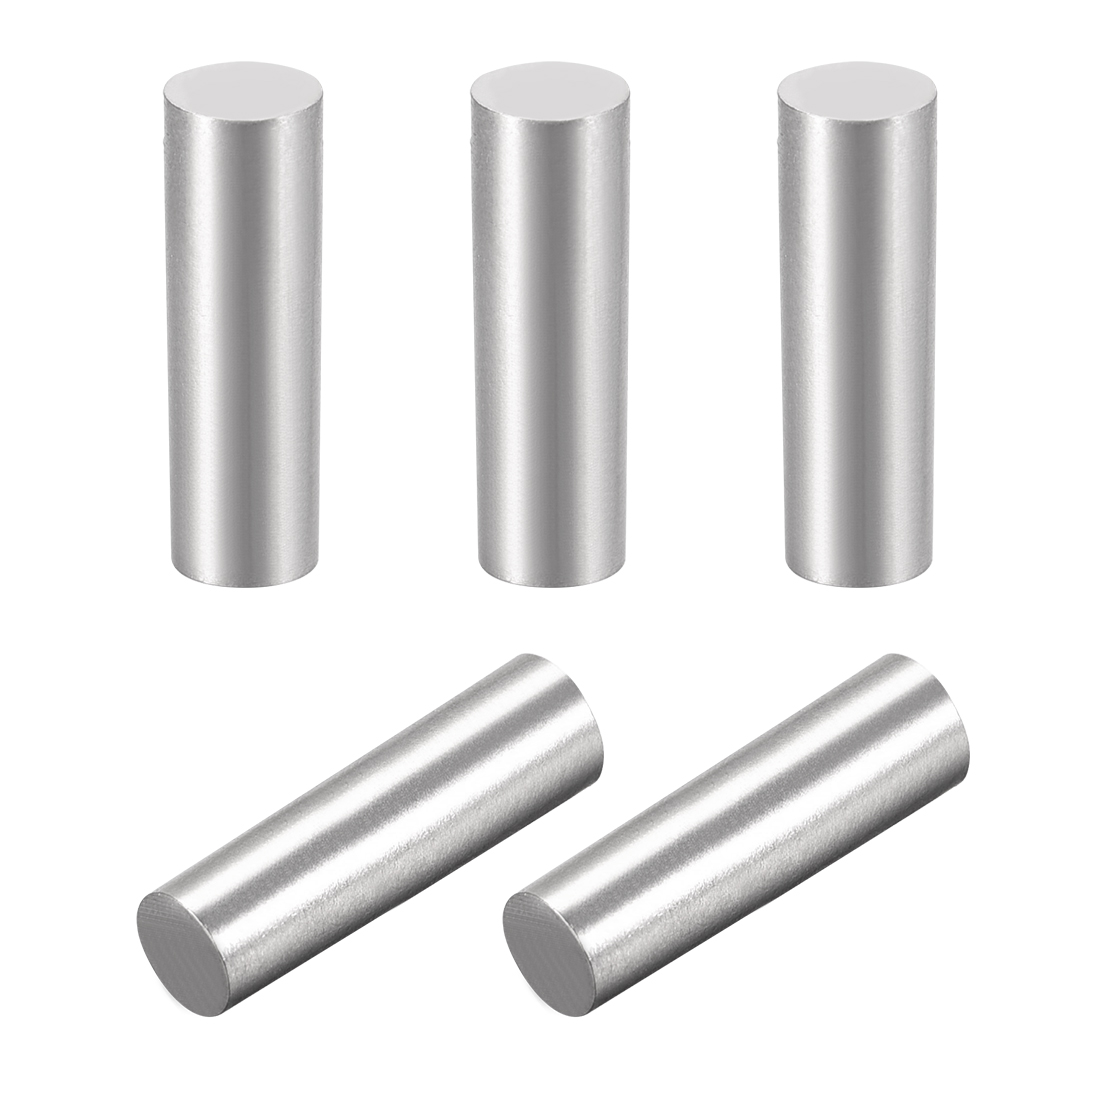 5Pcs 4mm x 20mm 1:50 Taper Pin 304 Stainless Steel Shelf Support Pin Fasten